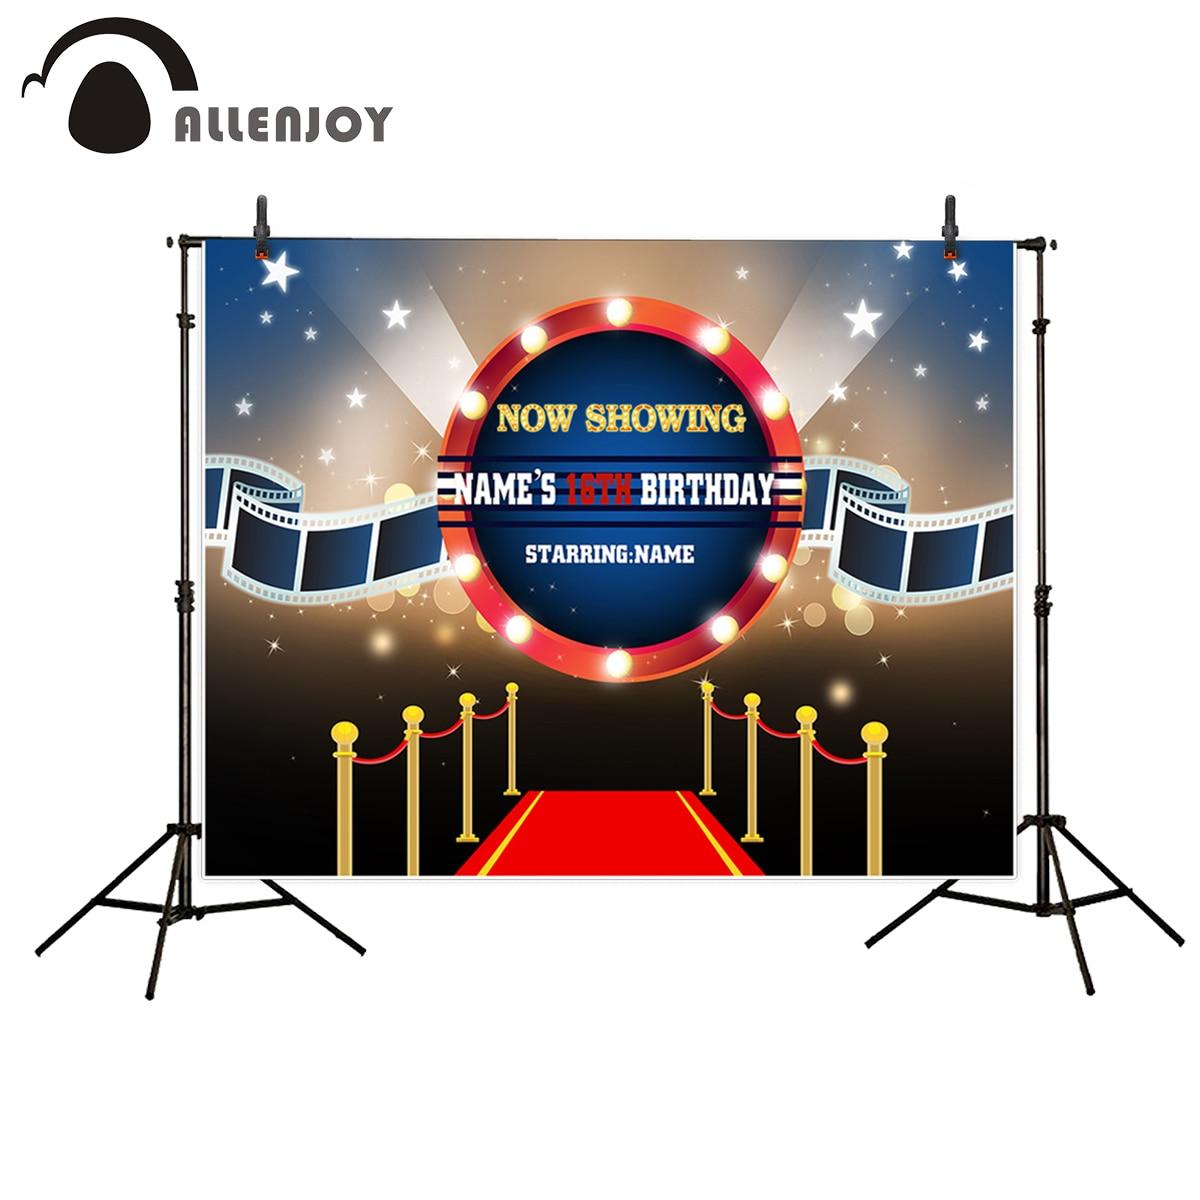 Allenjoy photography background Red carpet film spotlight birthday customized background photo studio camera fotografica